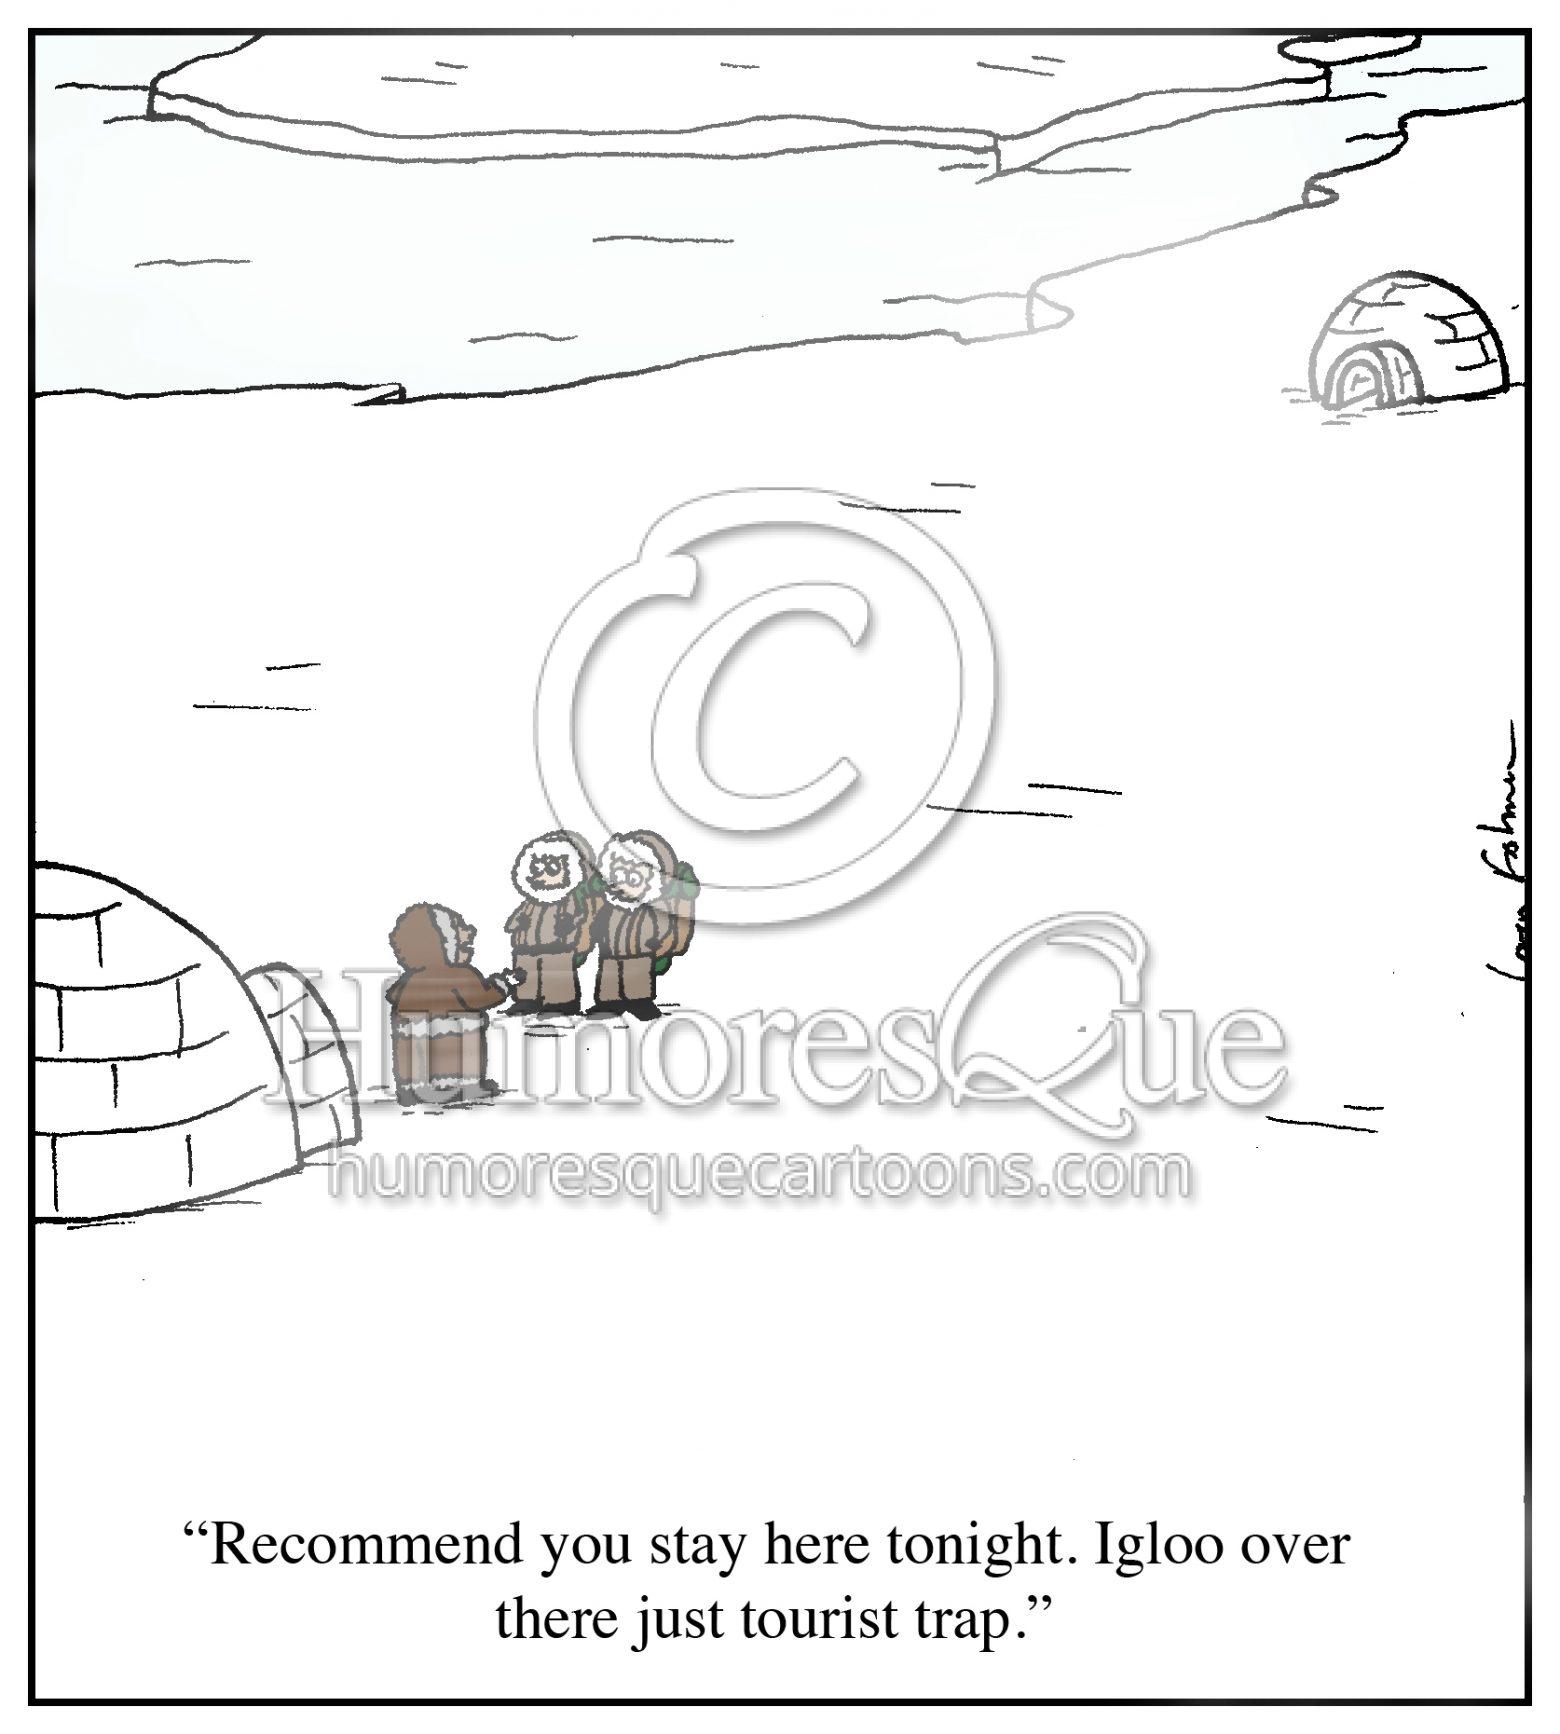 igloo tourist trap vacation cartoon